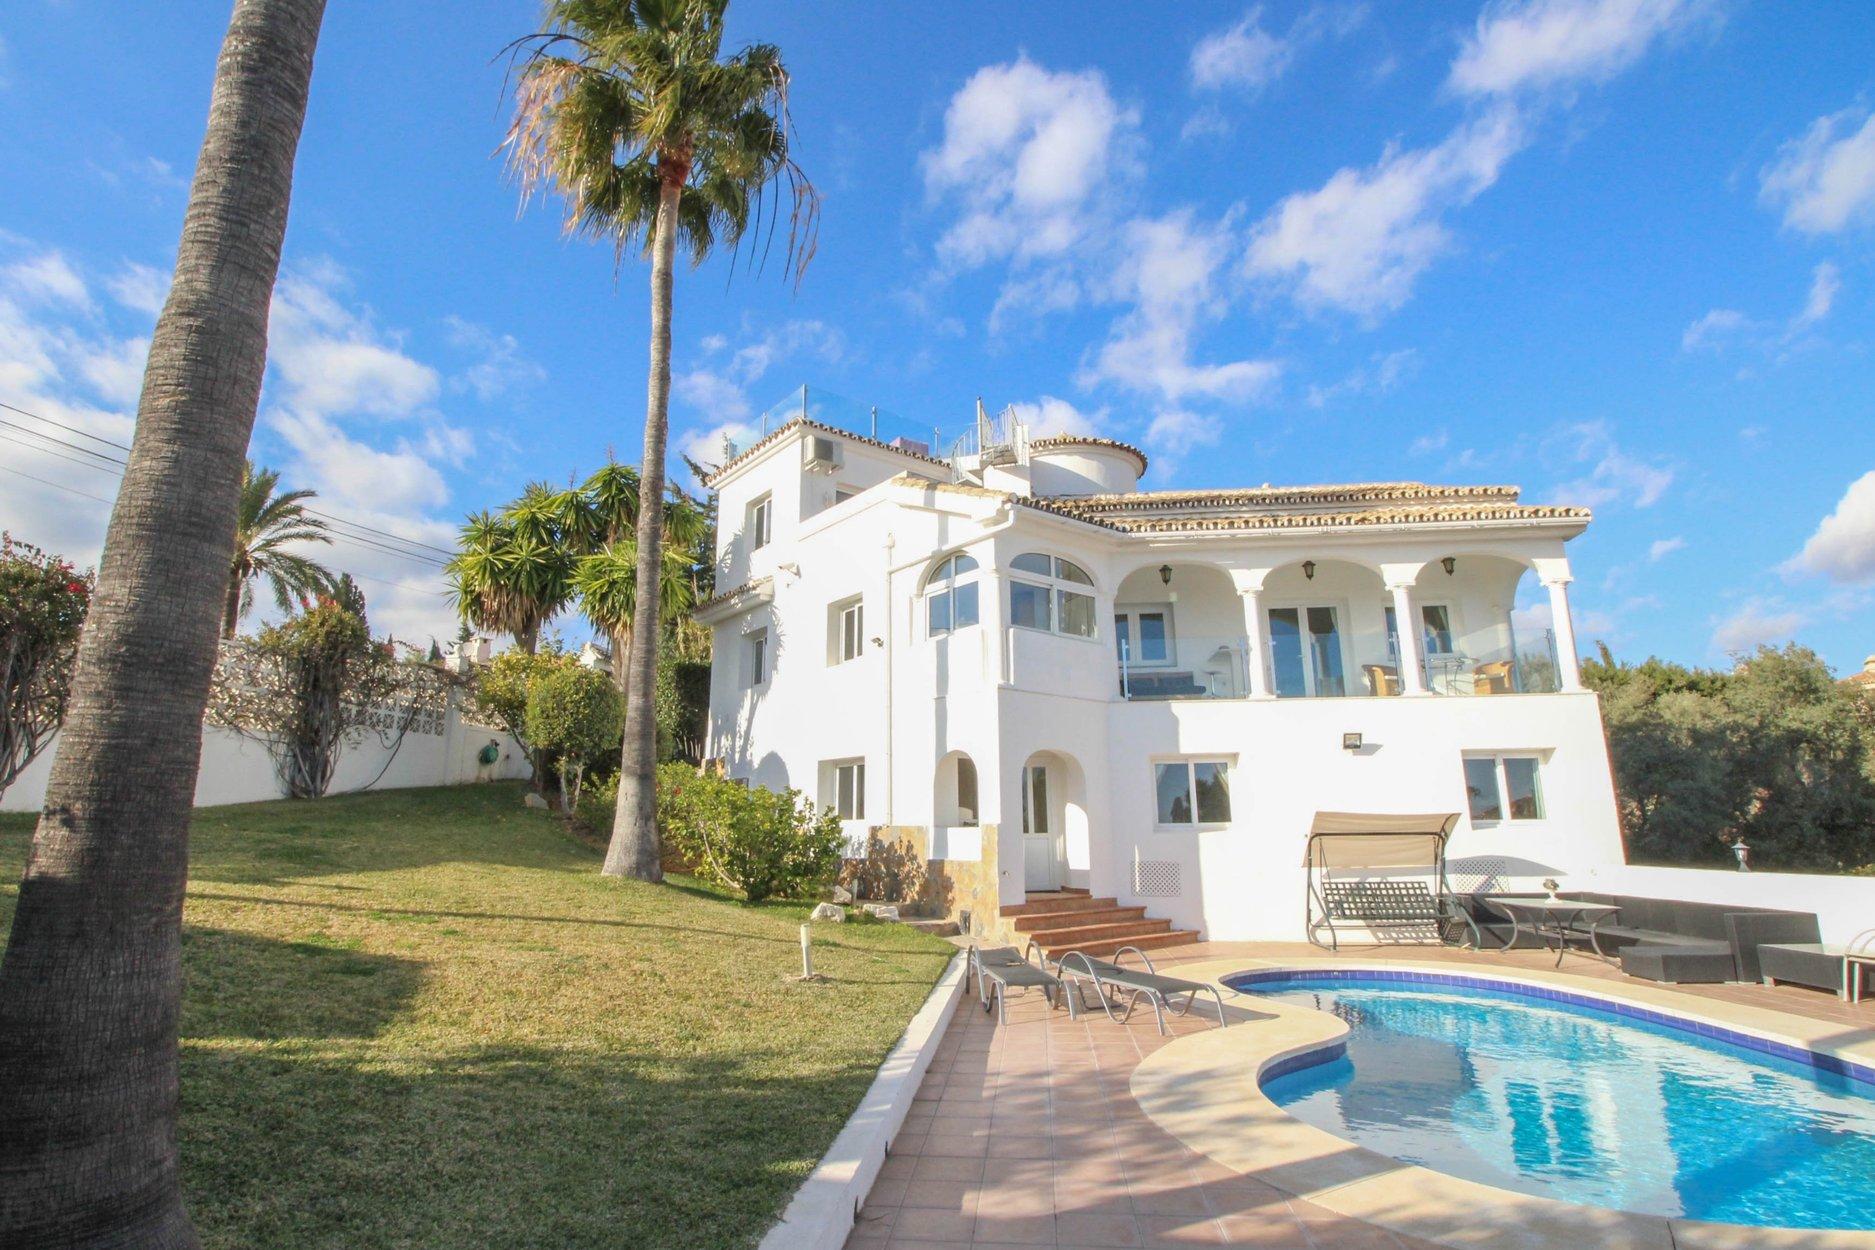 Villa for sale in Marbella, Elviria